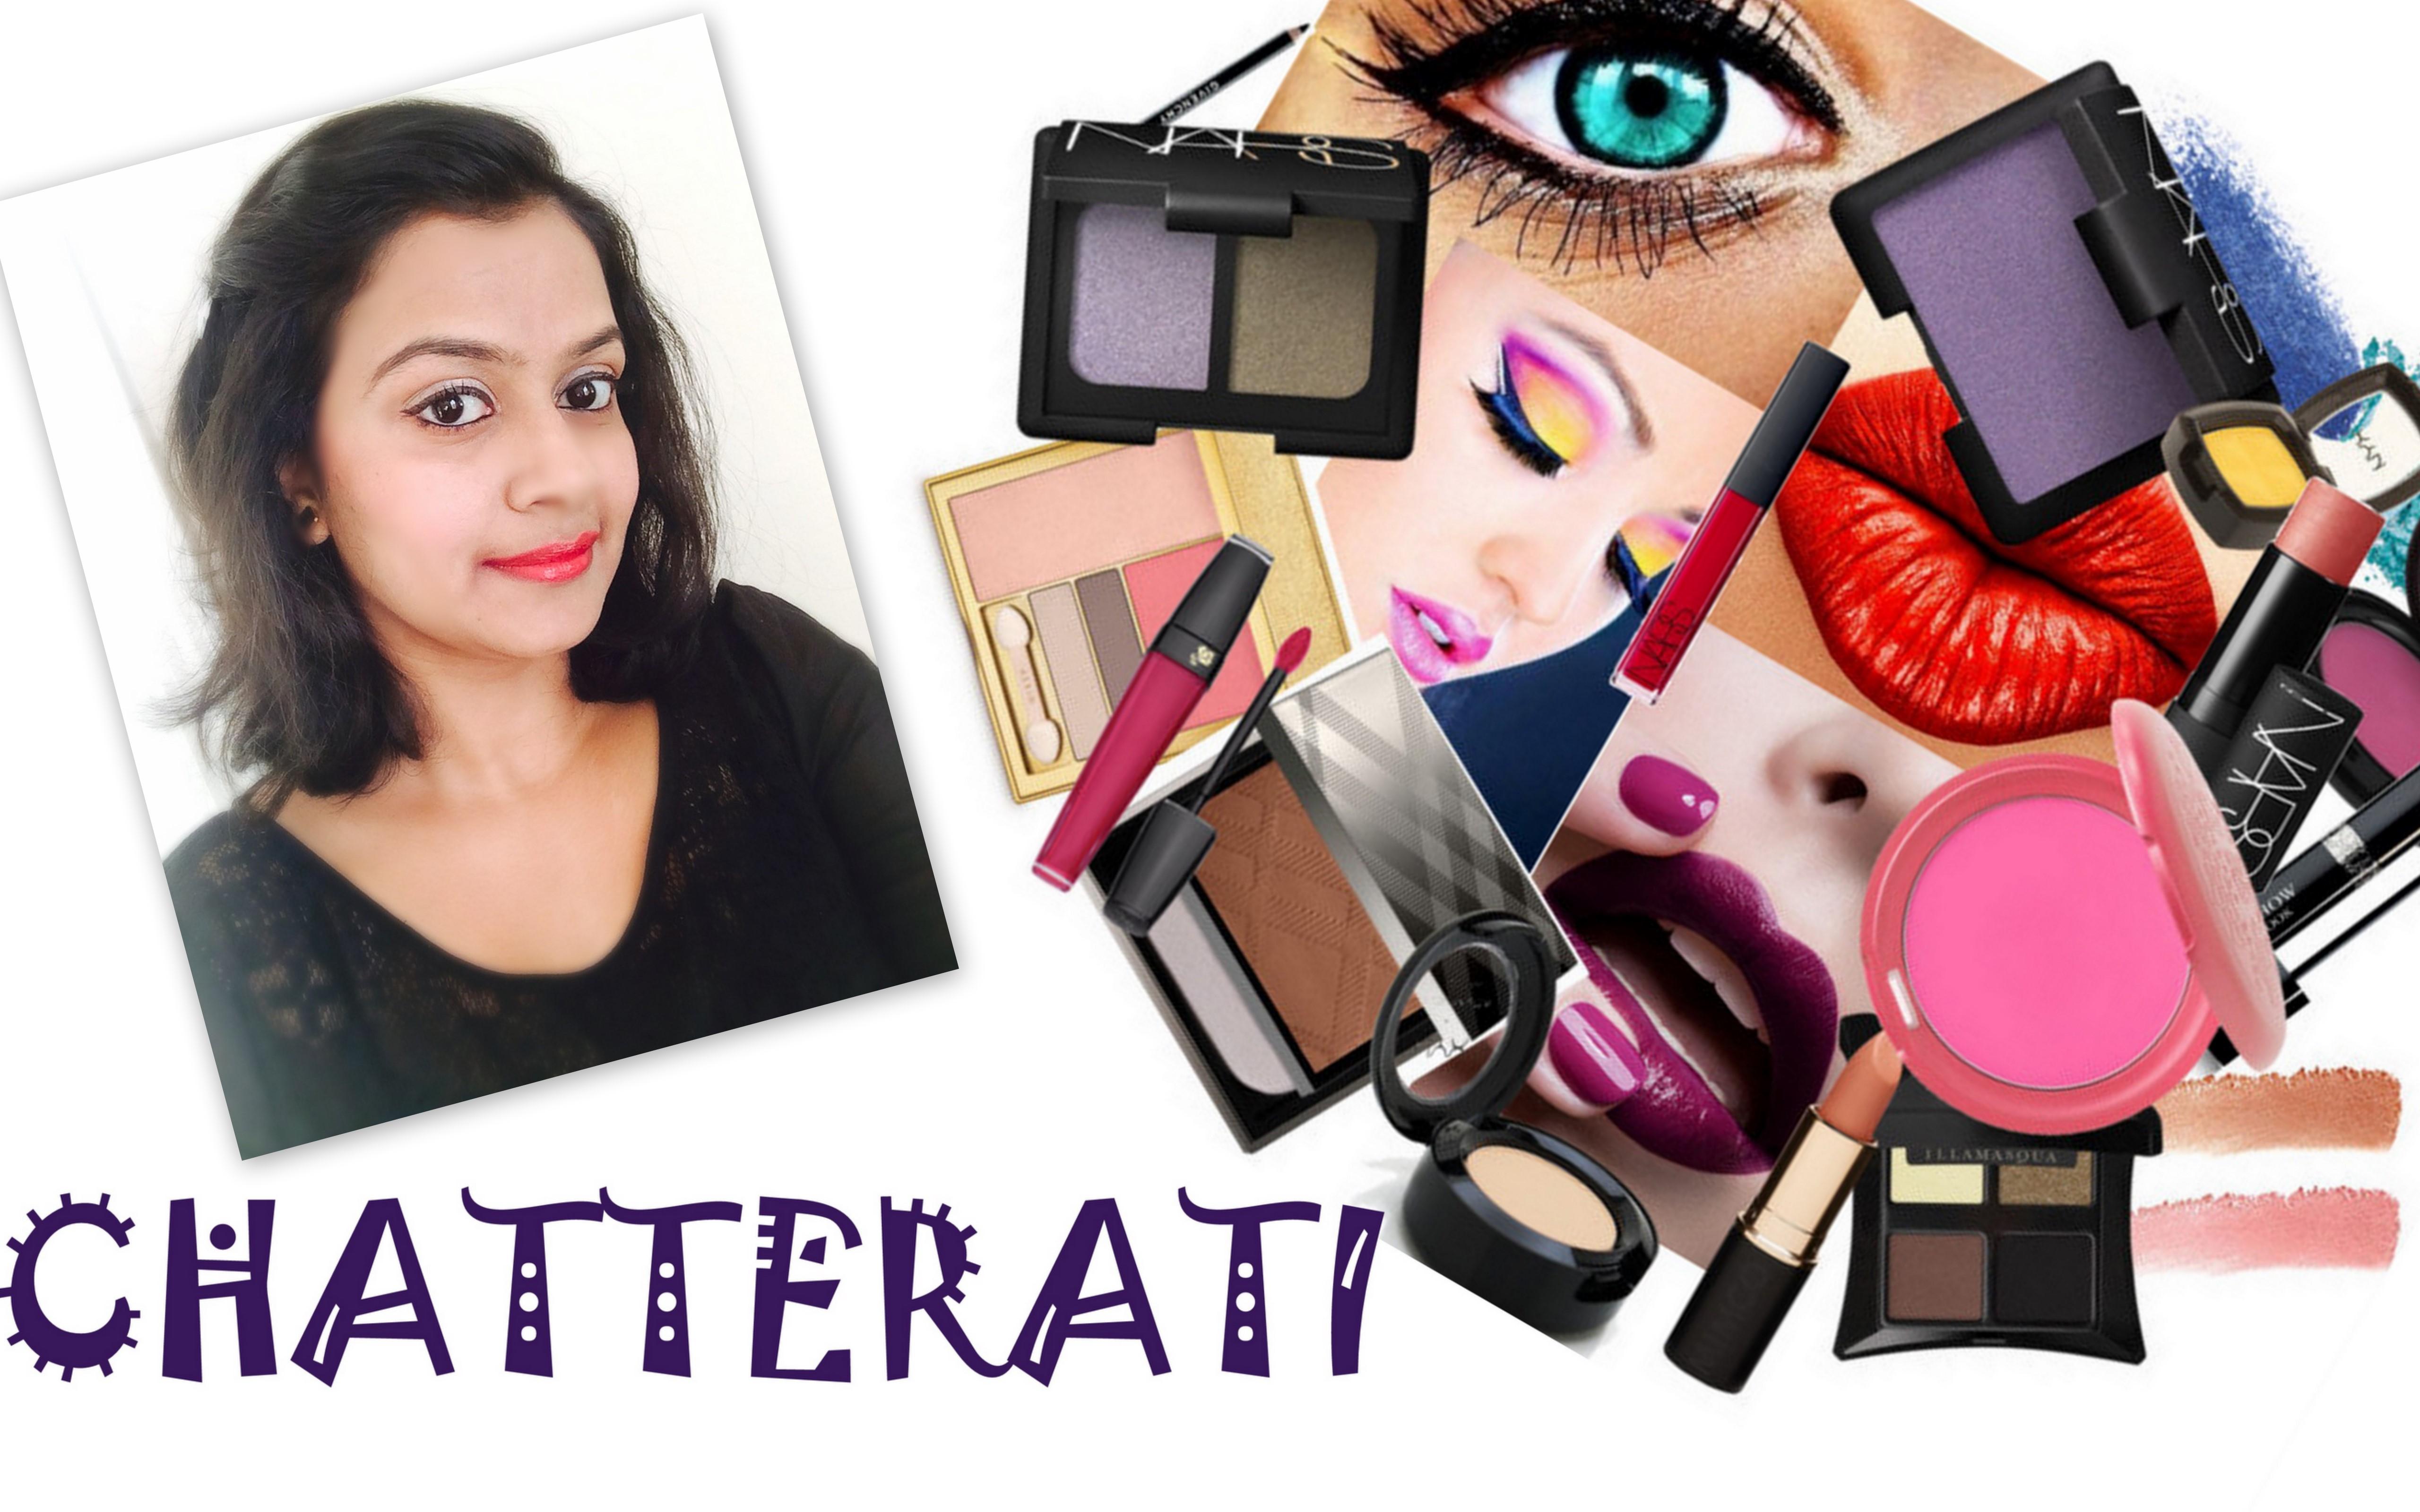 CHATTERATI : Meet Rachna of My Beauty Express